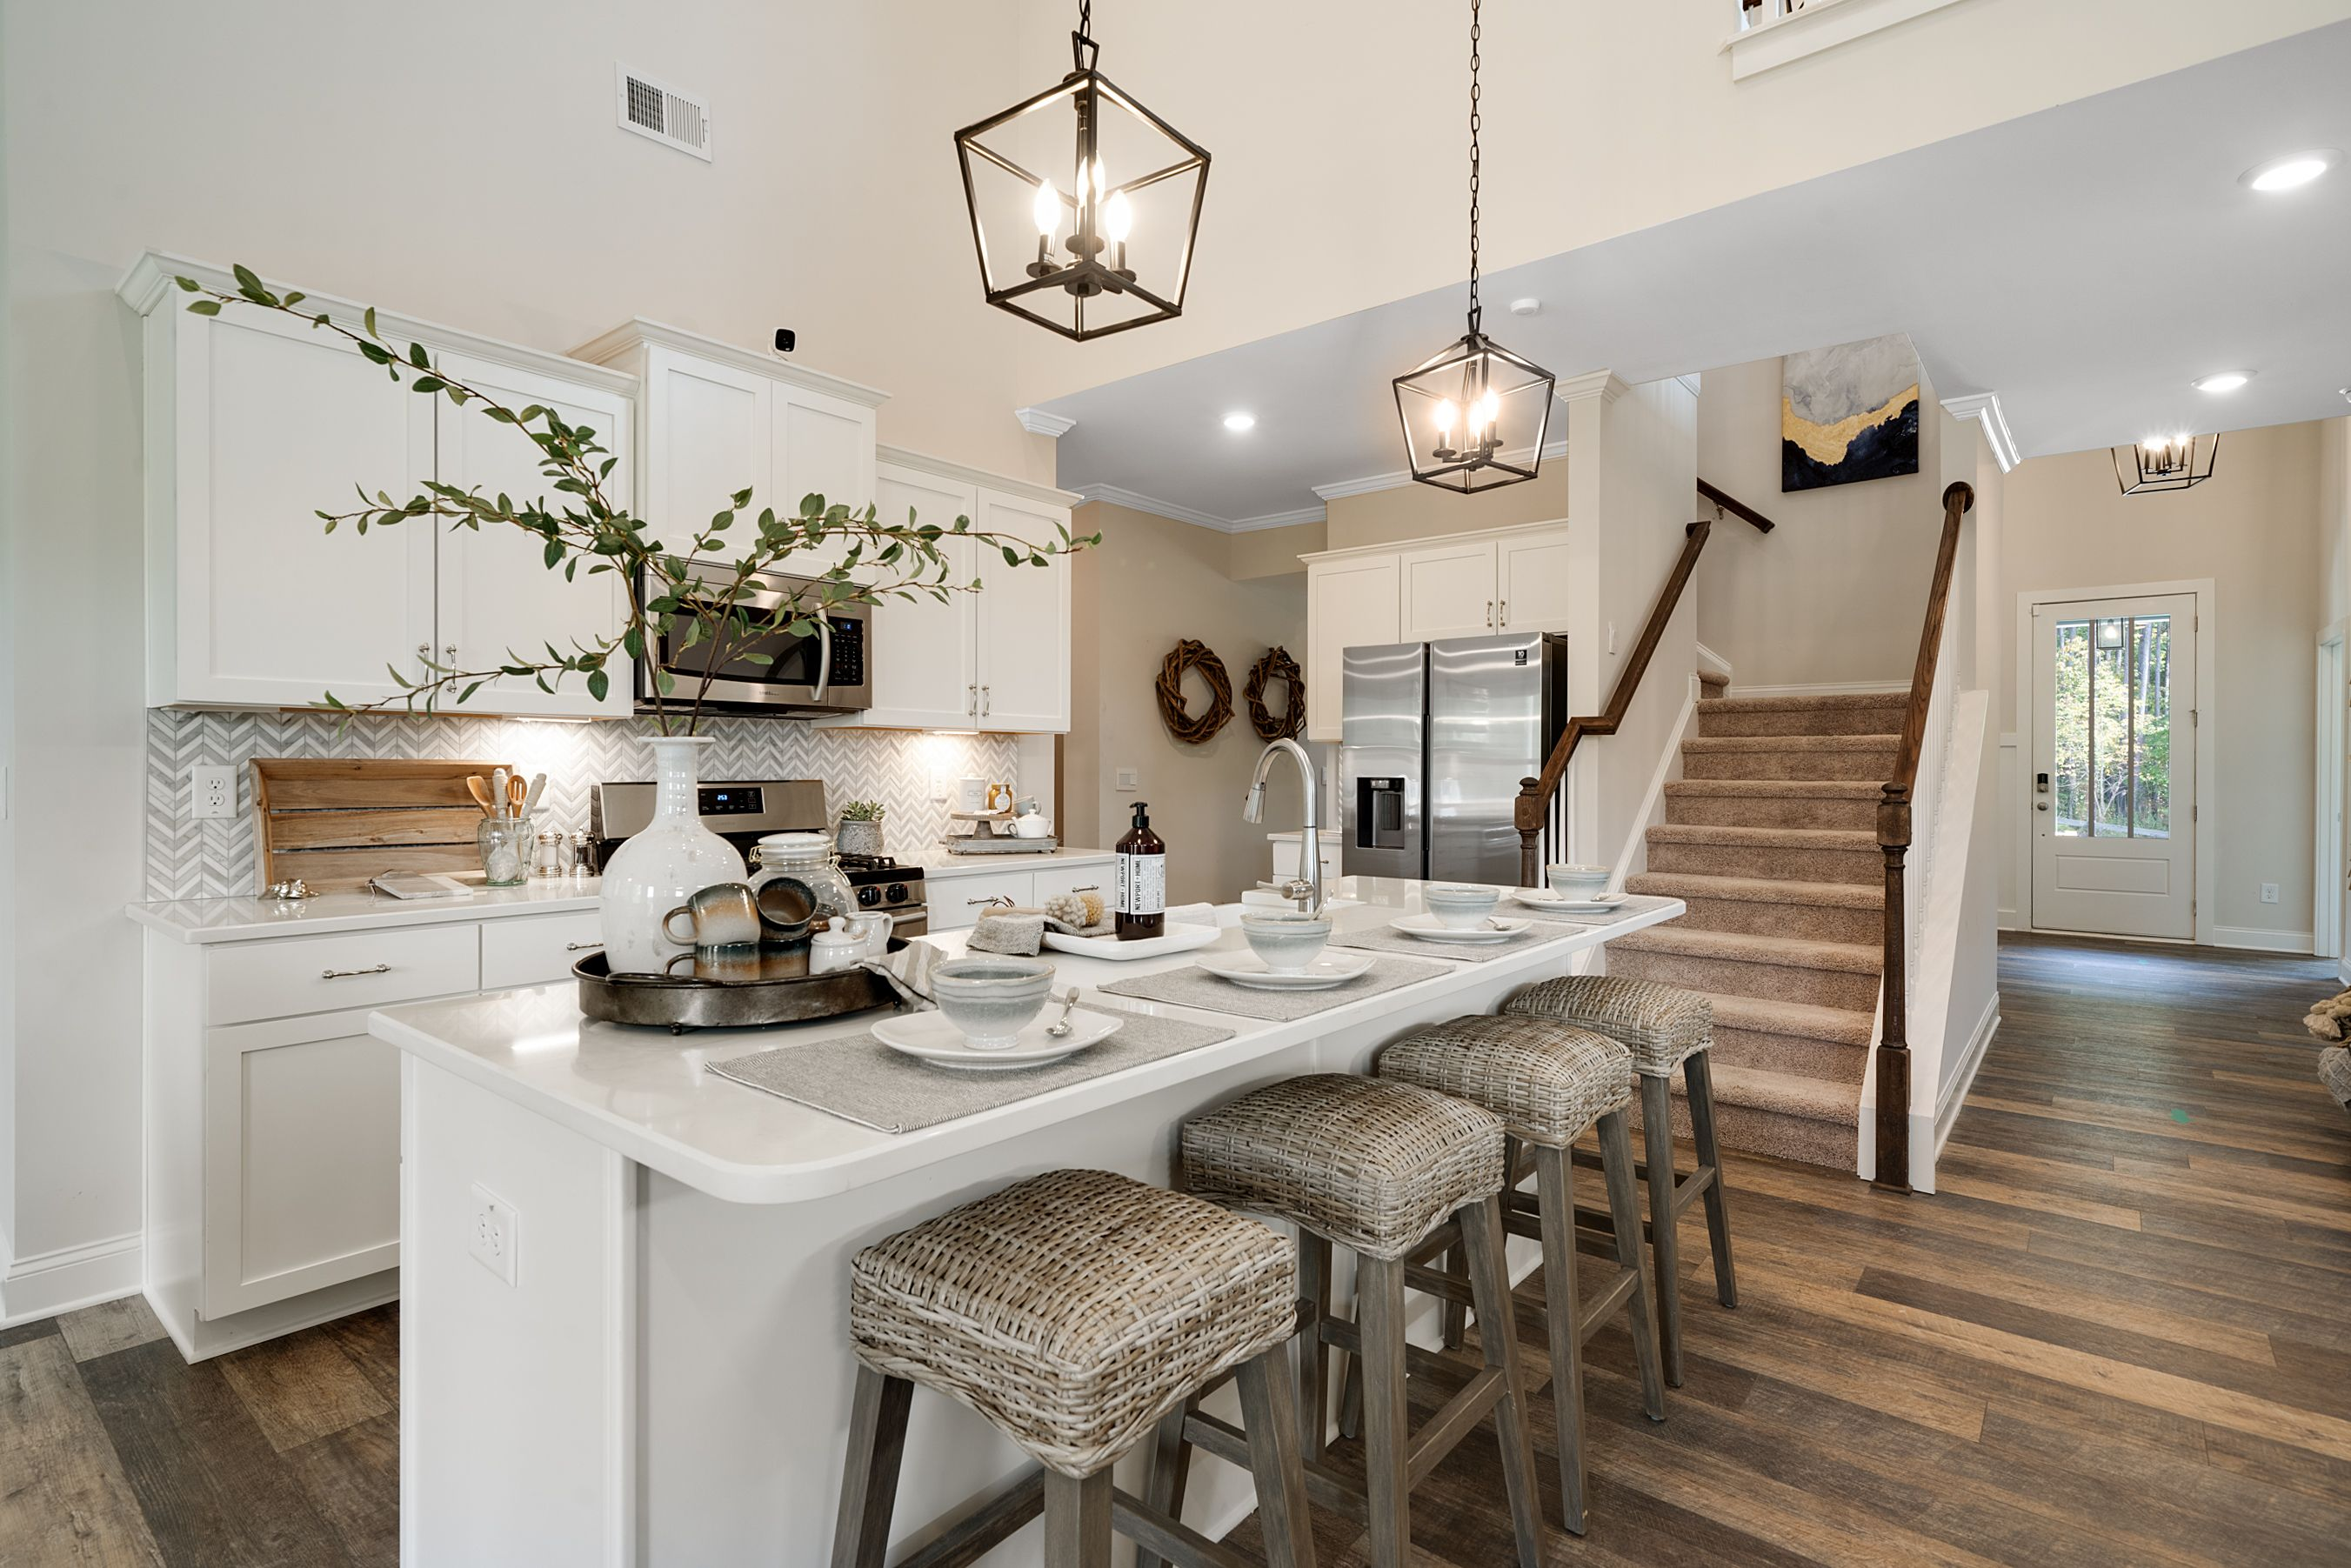 Kitchen featured in the Dalton (Farmhouse Series) By Artisan Built Communities in Atlanta, GA